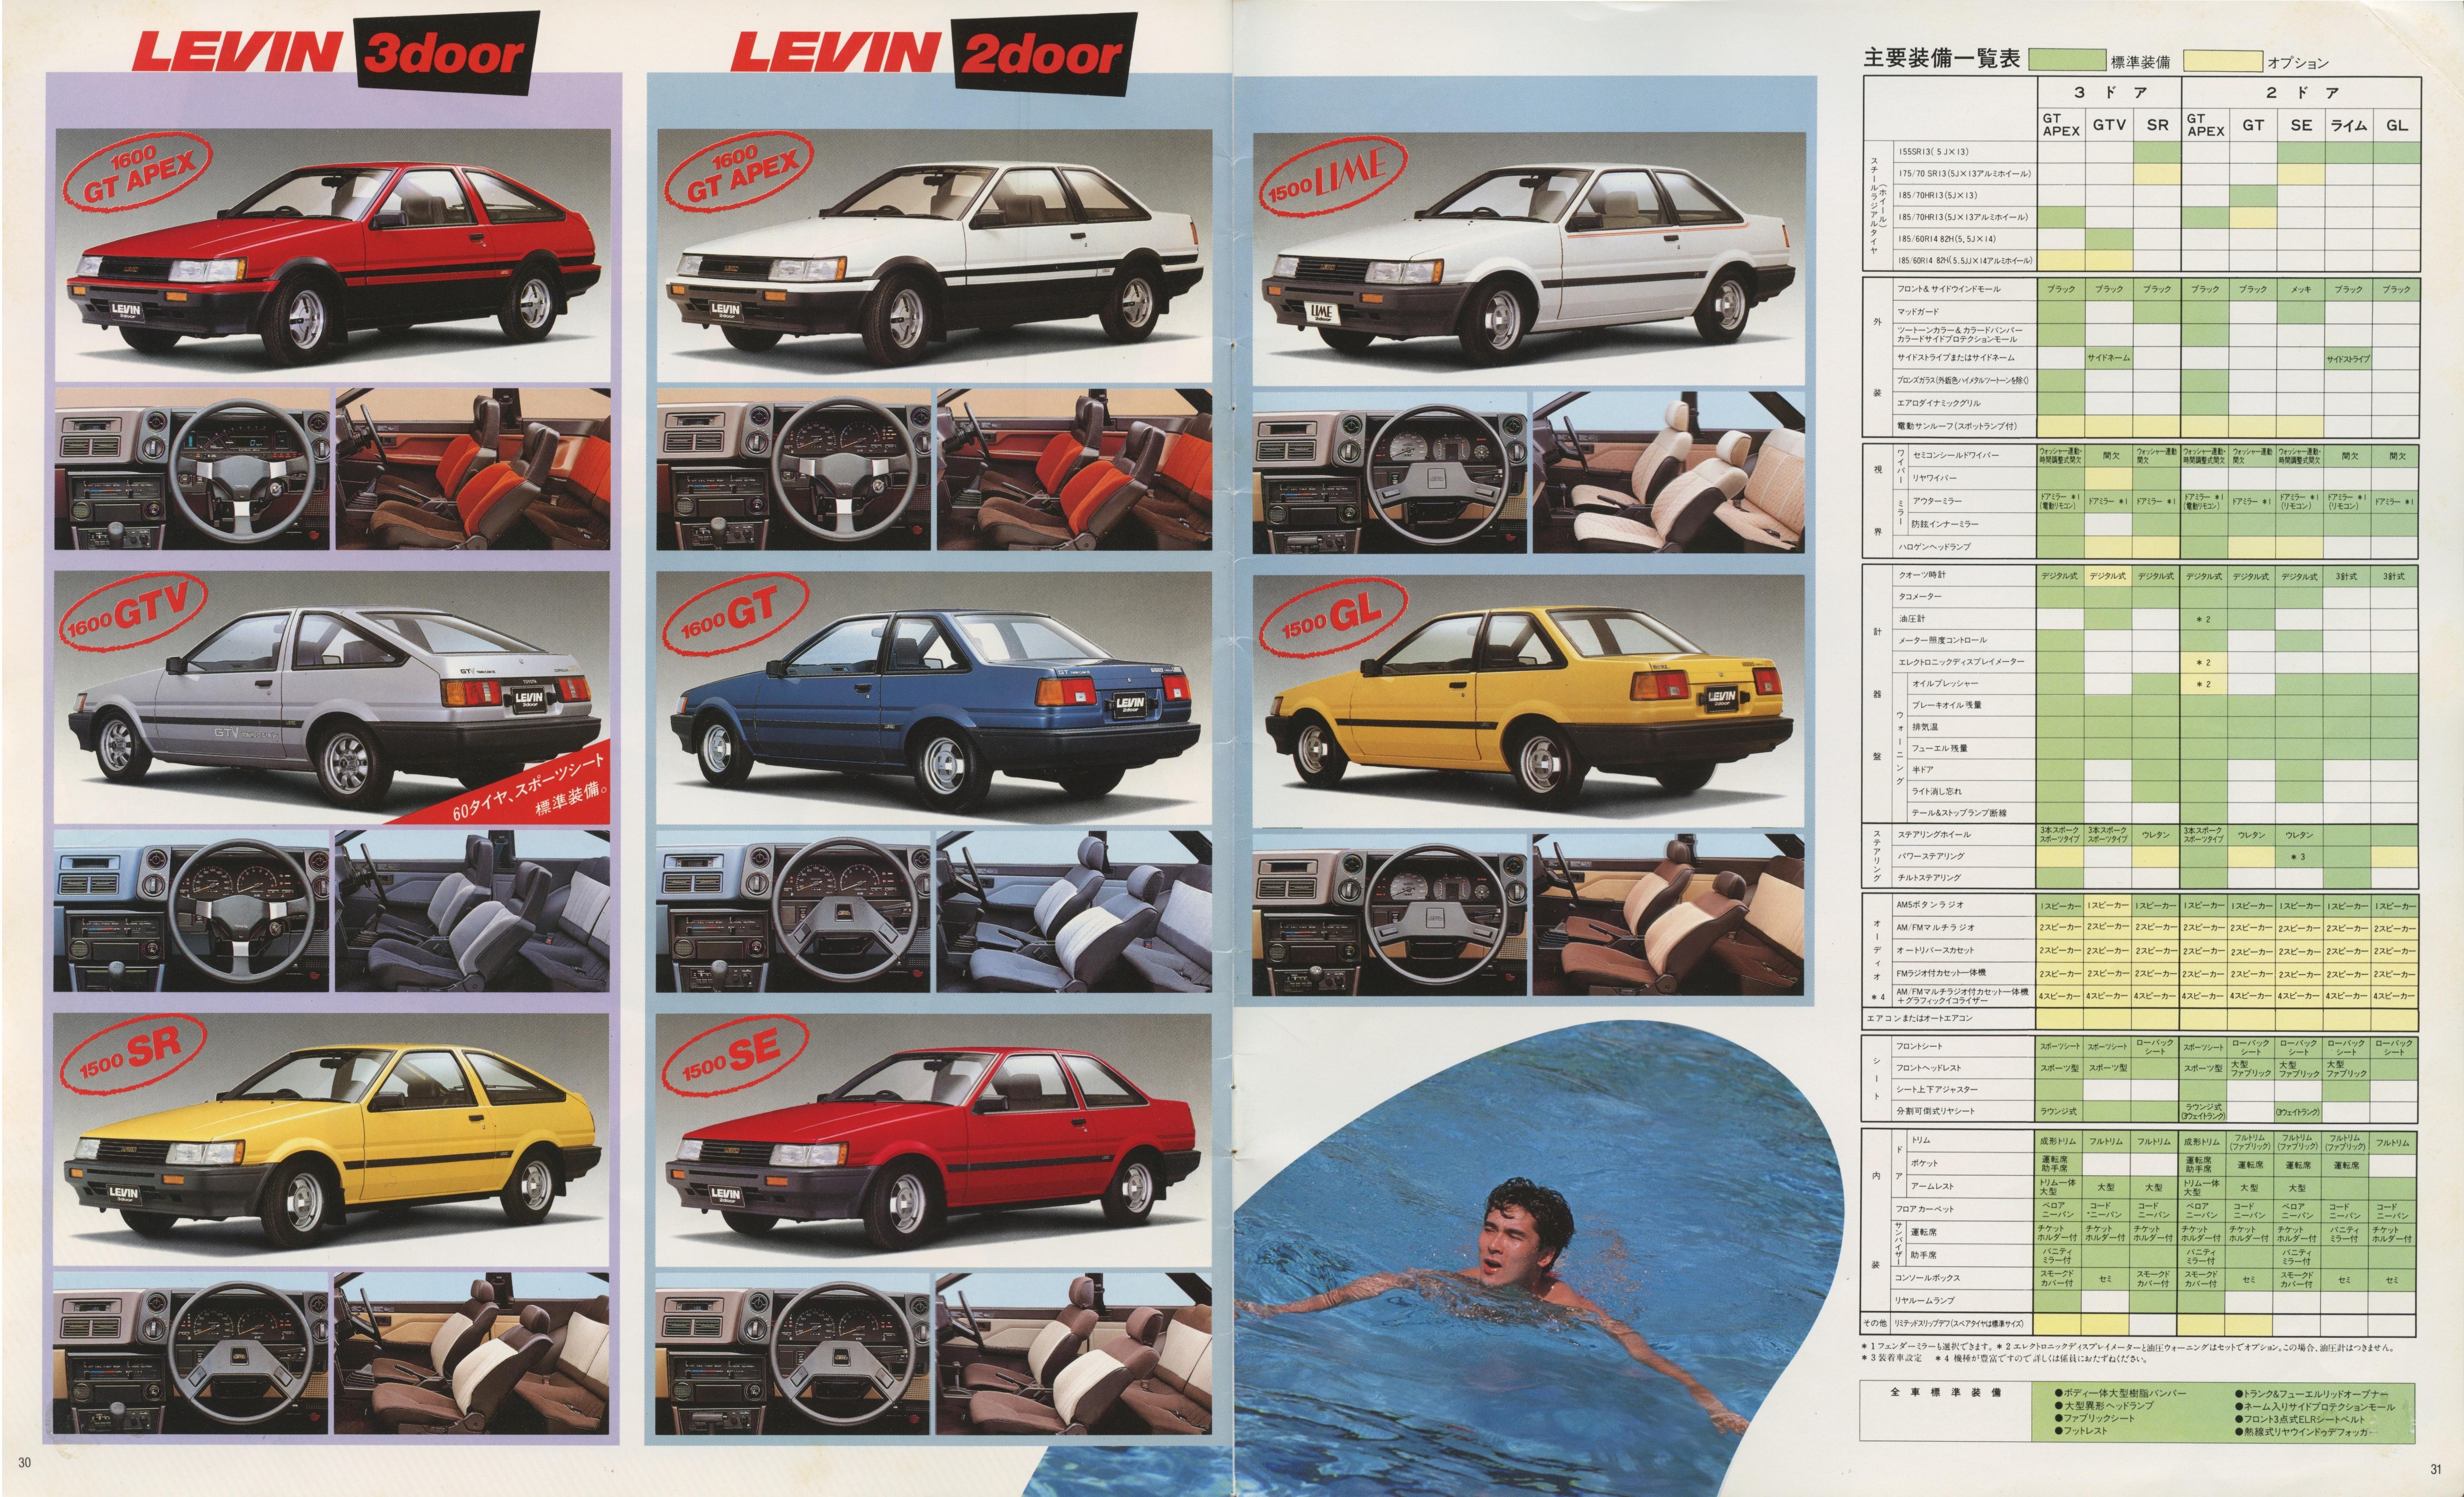 toyota-corolla-levin-ae86-brochure-page-30-31